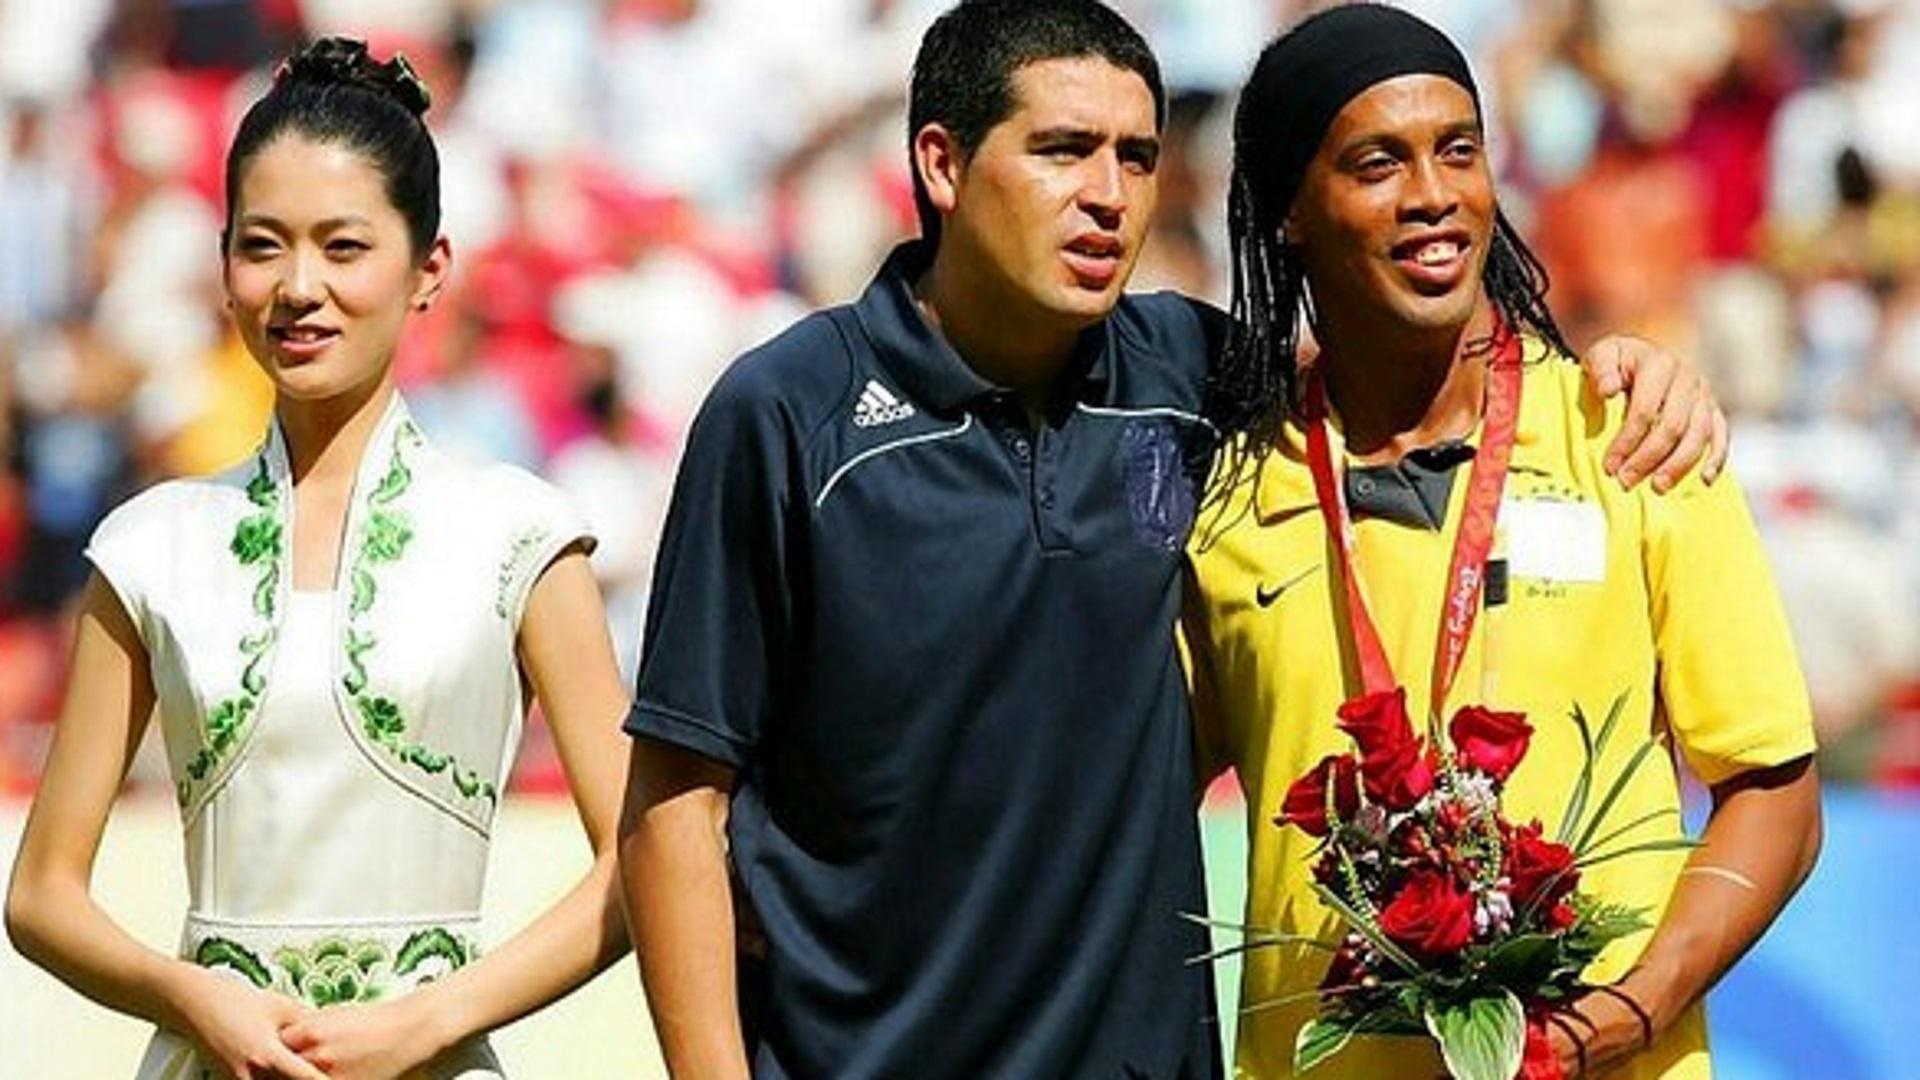 Chapecoense, Ronaldinho e Riquelme pronti a giocare gratis